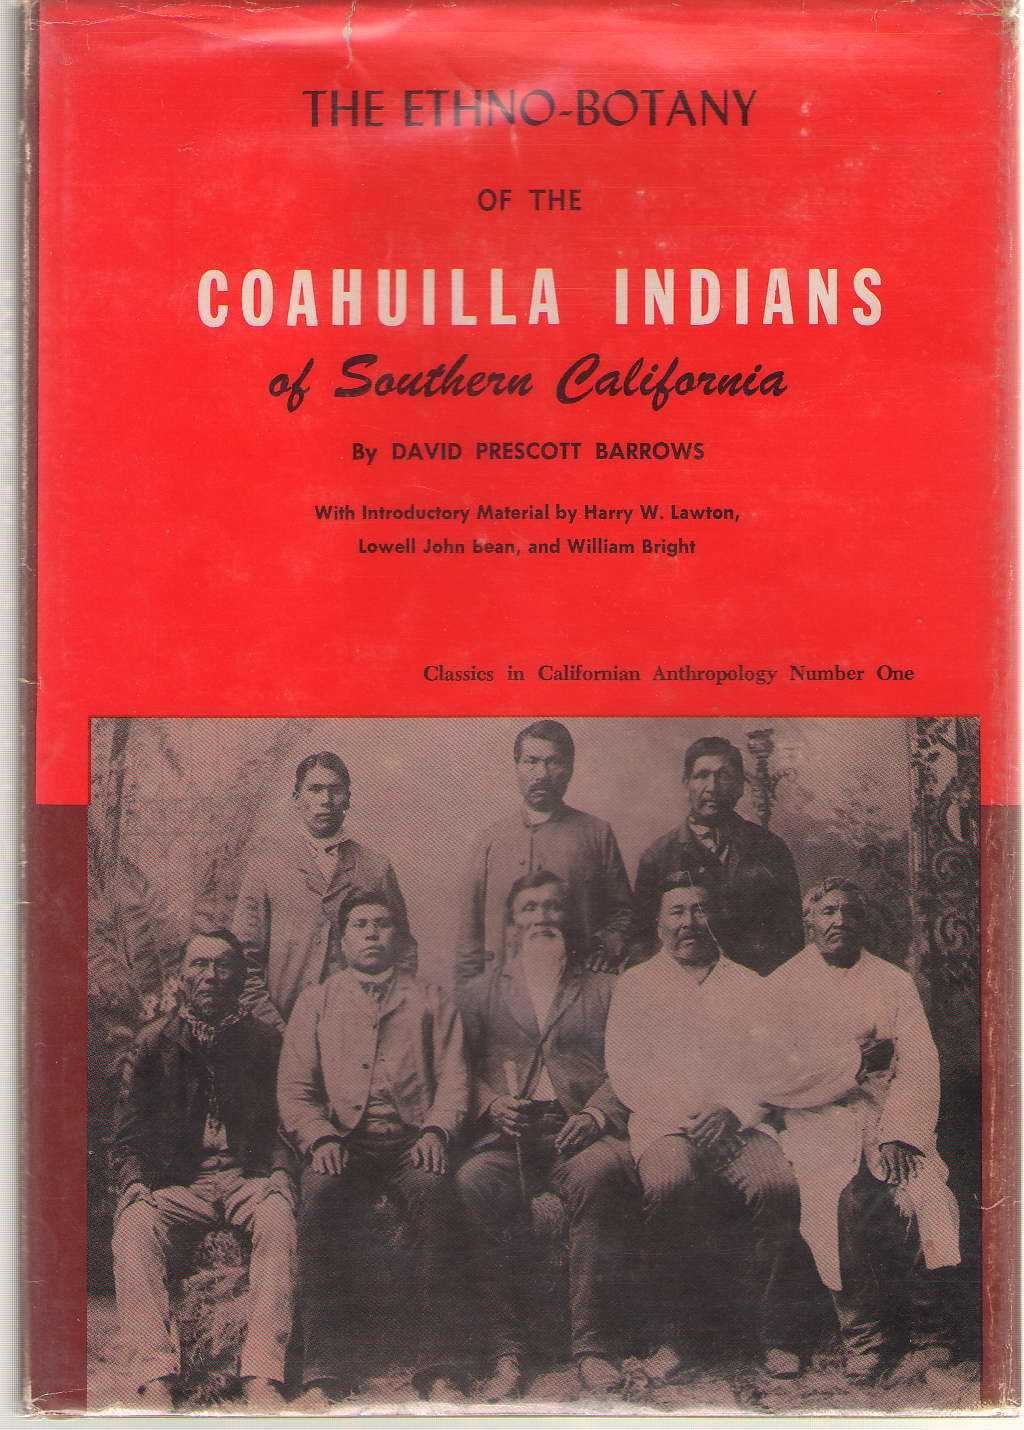 The Ethno-botany Of The Coahuilla Indians Of Southern California Includes a Cahuilla Bibliography, Barrows, David Prescott